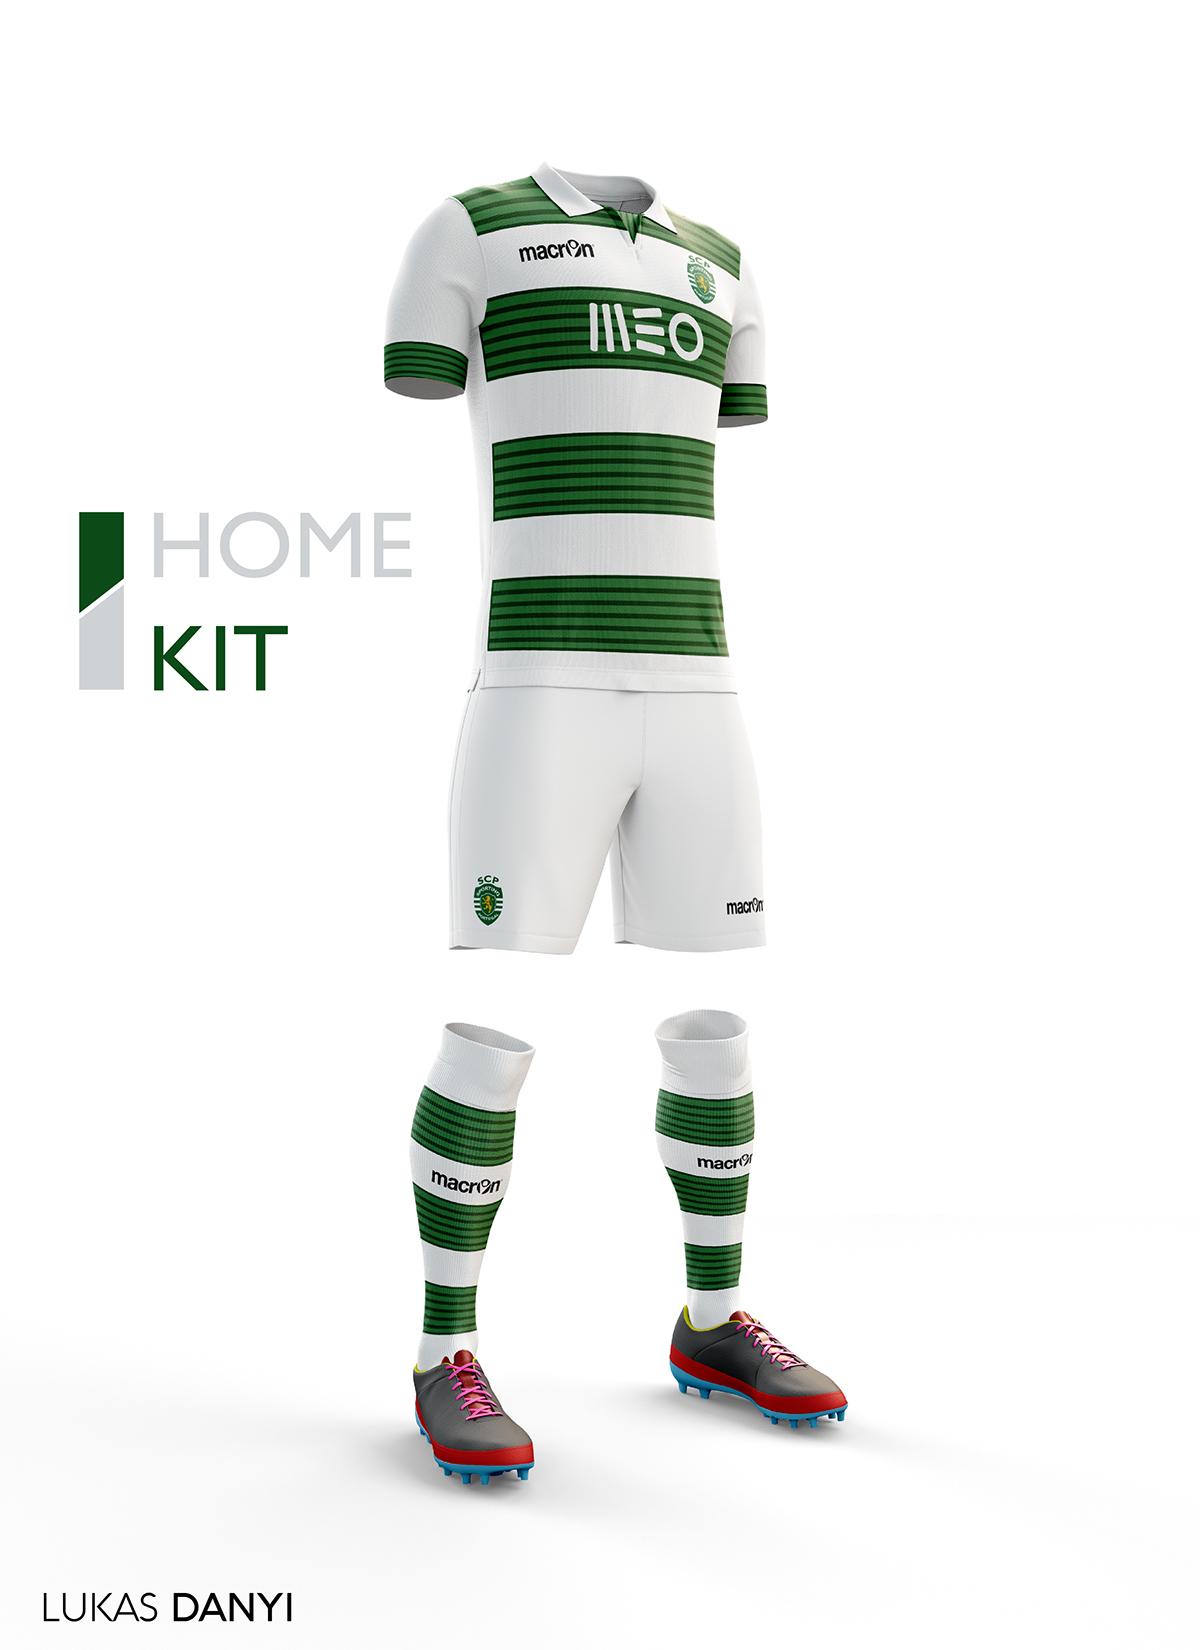 87219ca0796 Sporting CP Football Kit 16/17. on Behance